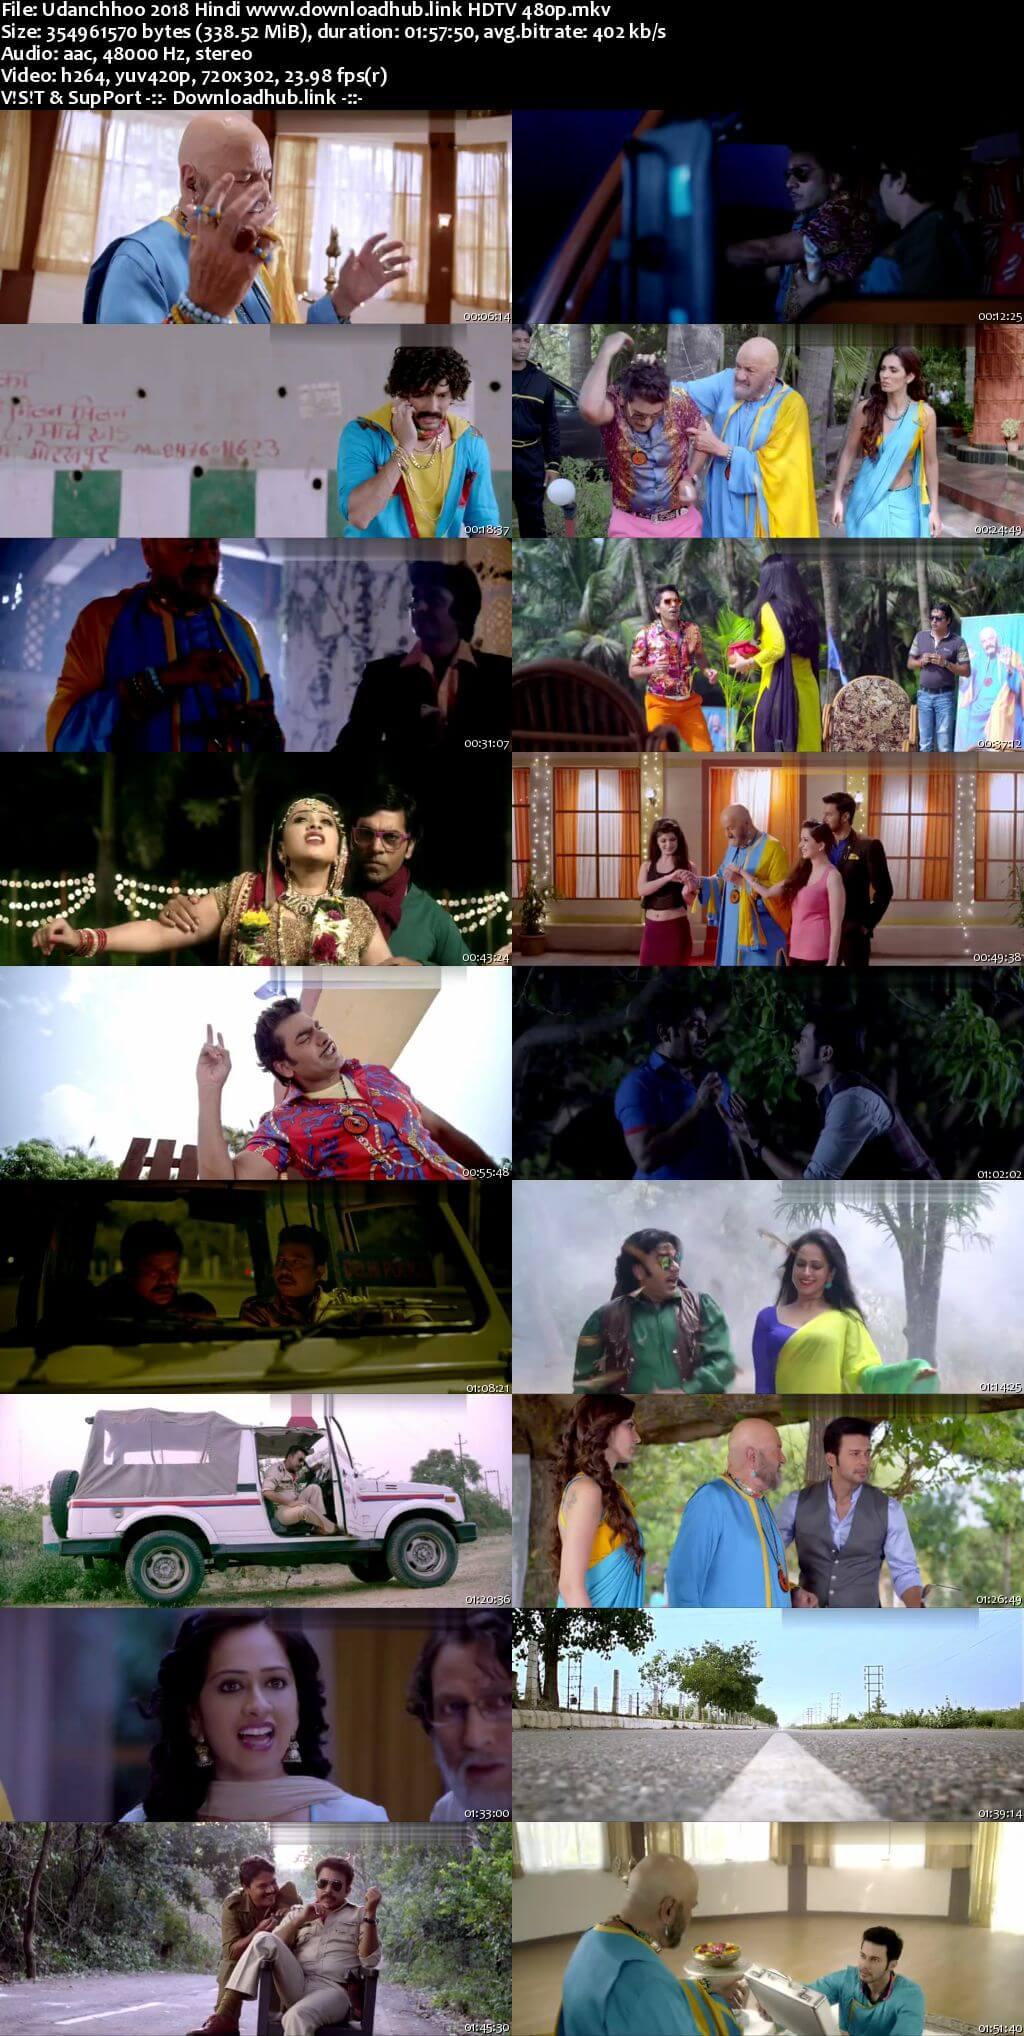 Udanchhoo 2018 Hindi 300MB HDTV 480p